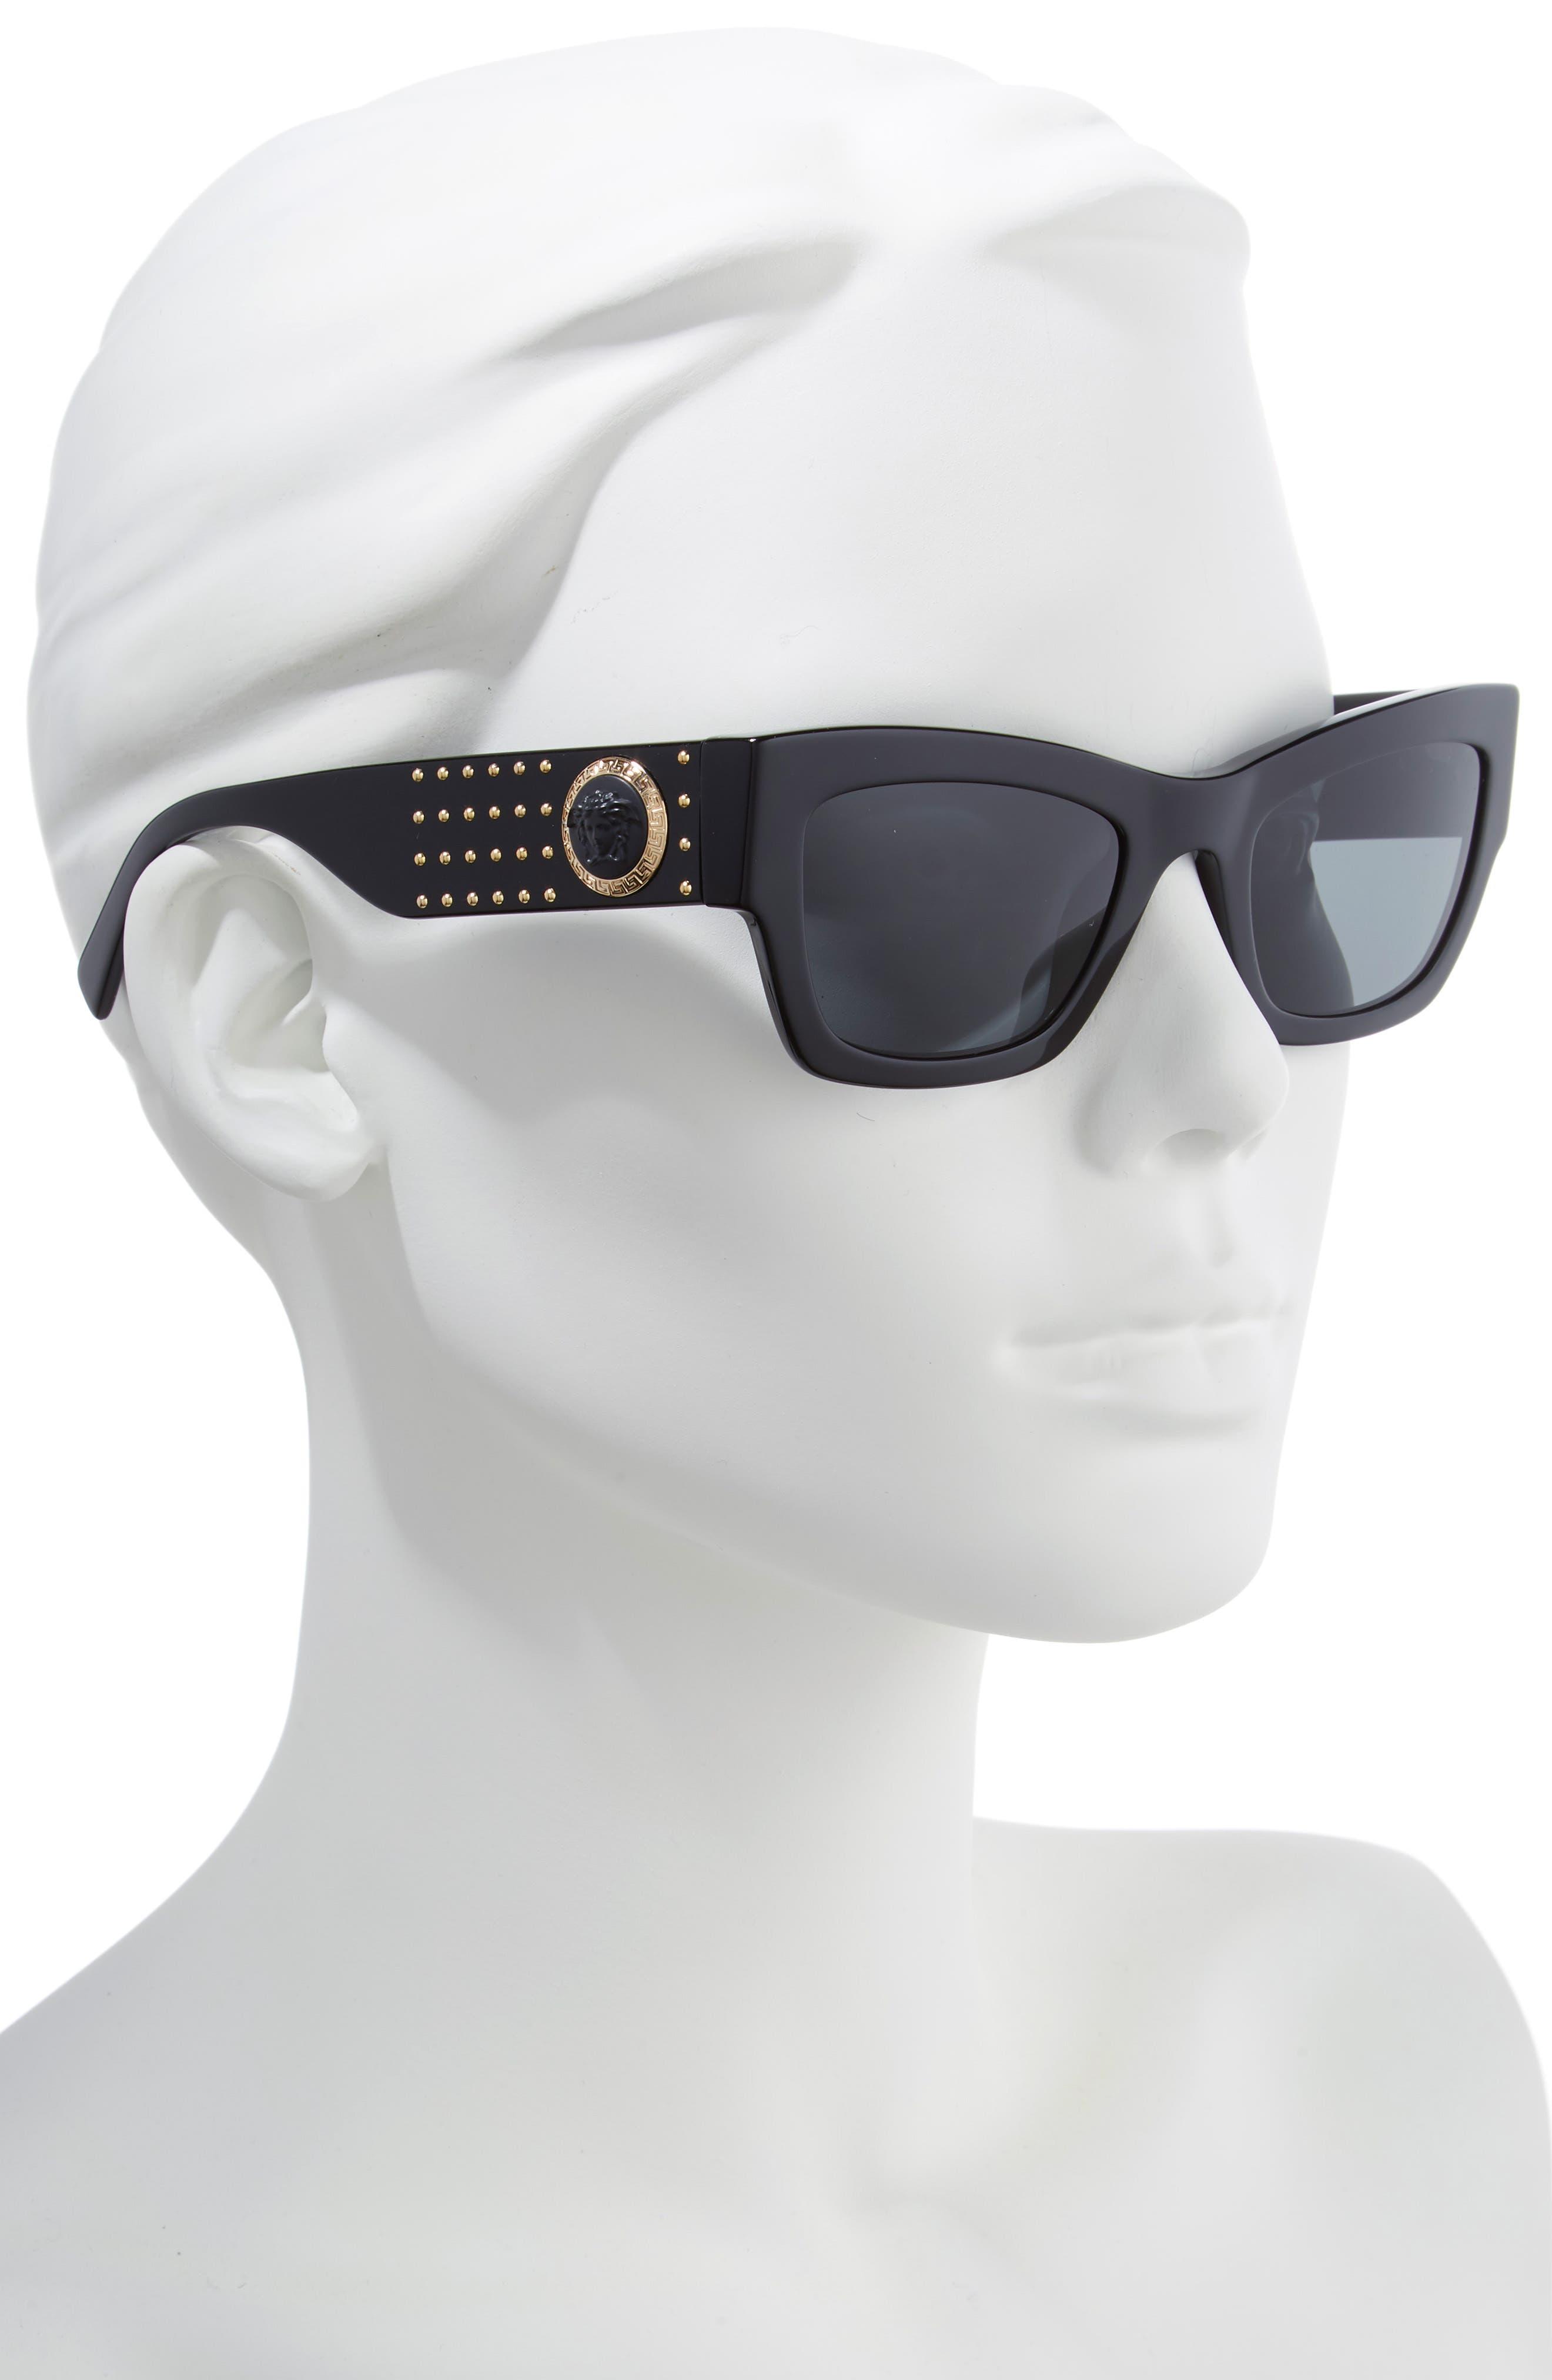 Medusa 52mm Square Sunglasses,                             Alternate thumbnail 2, color,                             GREY SOLID